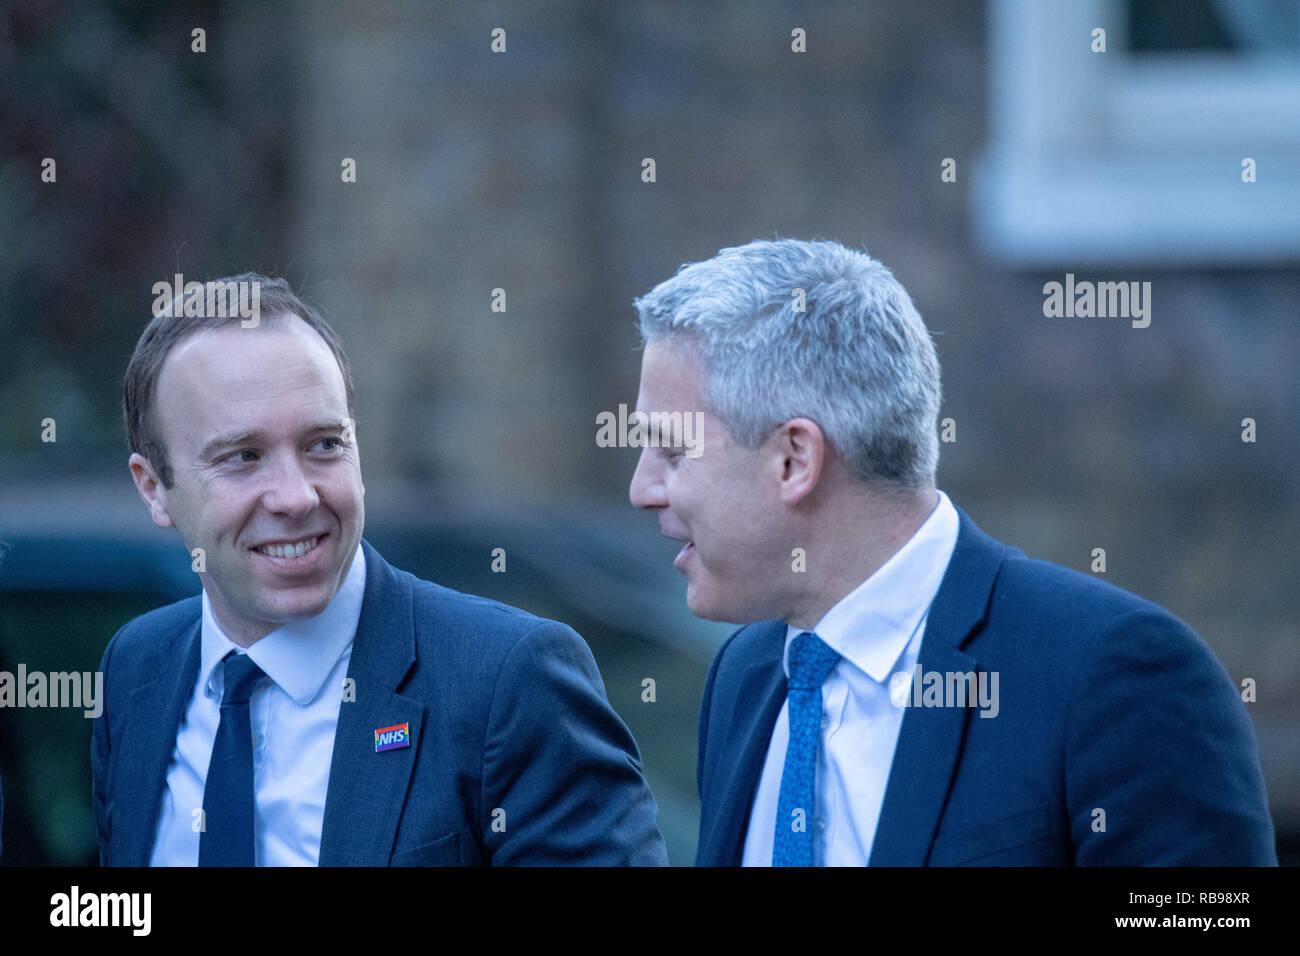 London 8thJanuary 2019,  Matt Hancock, MP PC, Health Secretary (left) and Stephen Barclay, MP PC, Brexit Secretary arrive at a Cabinet meeting at 10 Downing Street, London Credit Ian Davidson/Alamy Live News - Stock Image